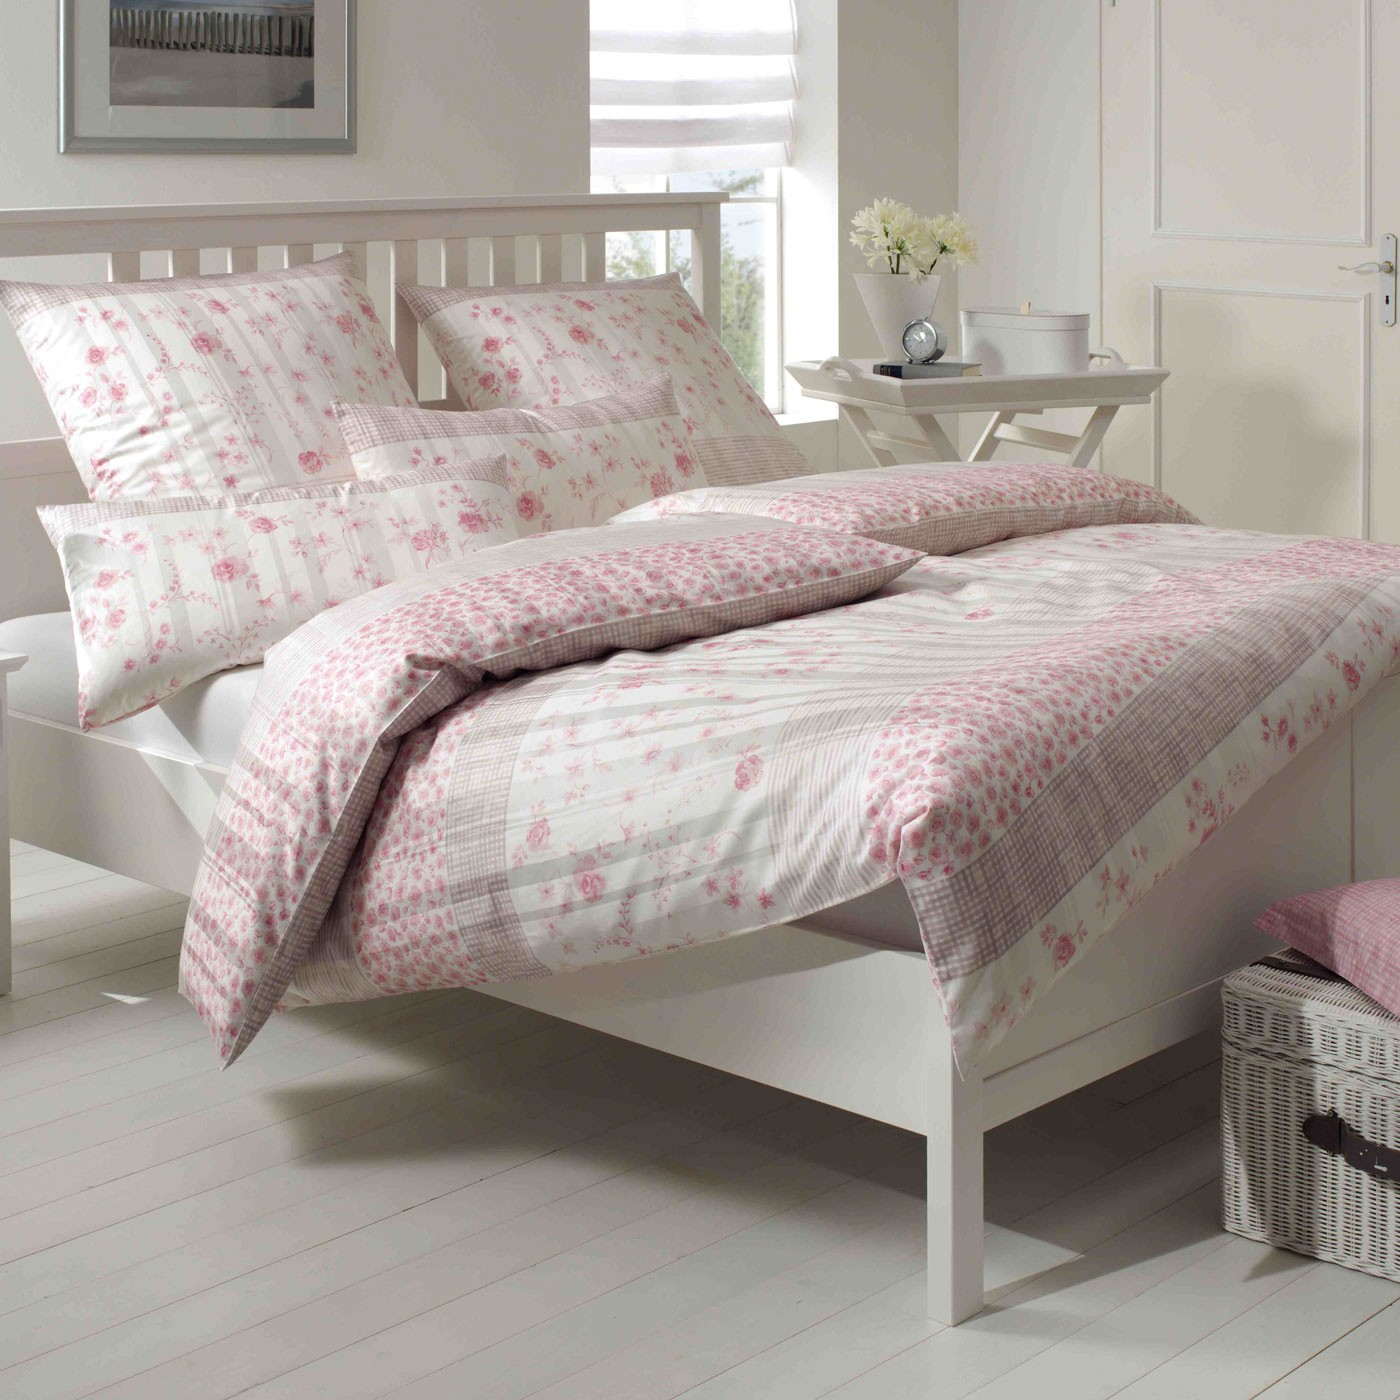 bettw sche elegante cornwall 2083 rose. Black Bedroom Furniture Sets. Home Design Ideas